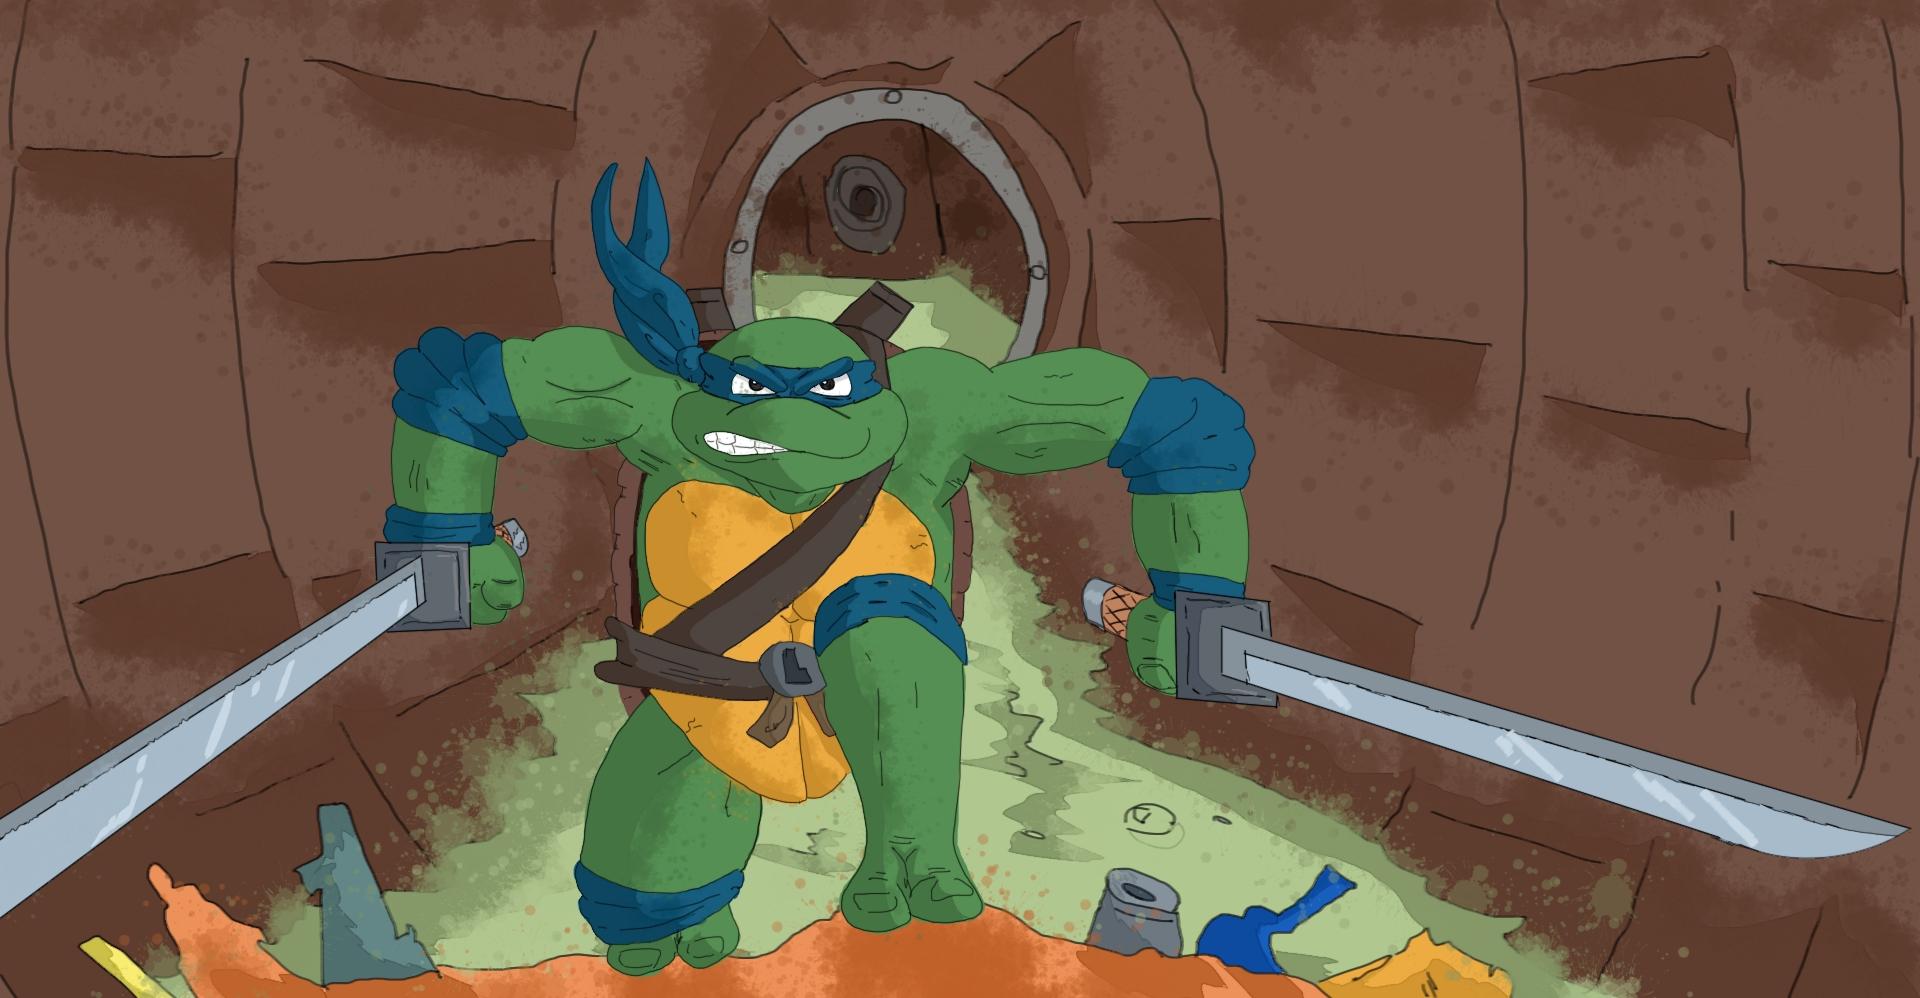 Ninja in a manhole.